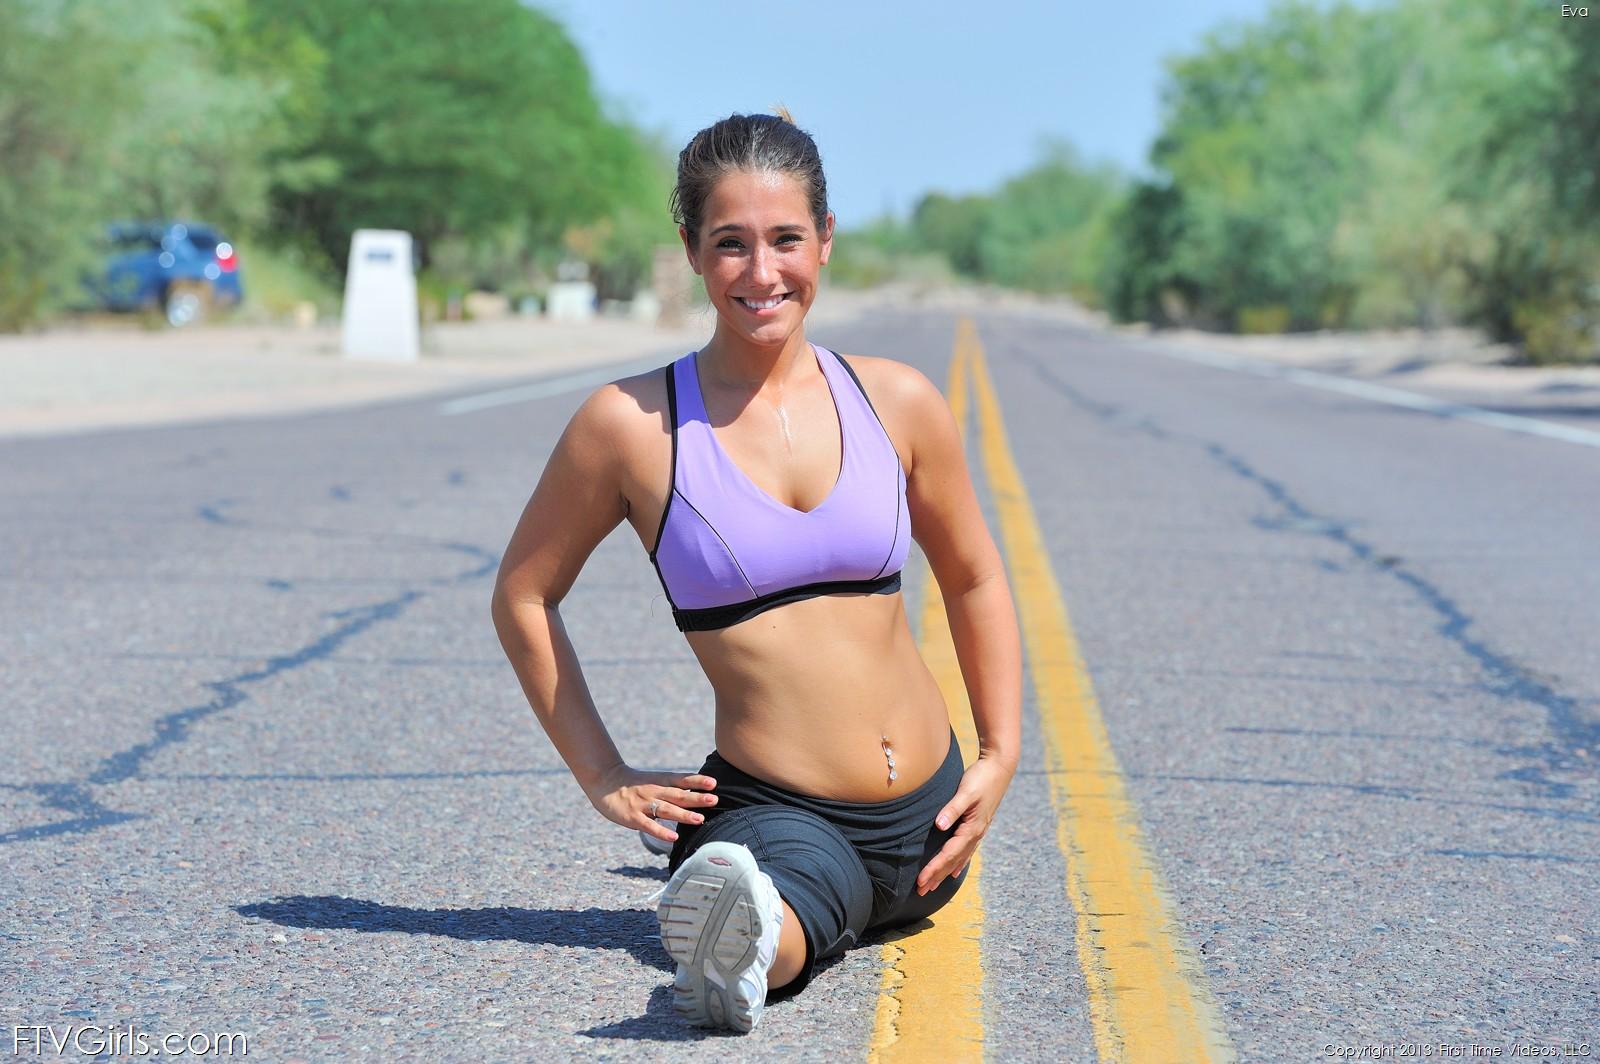 eva-flash-public-jogging-workout-nude-yoga-ftvgirls-18